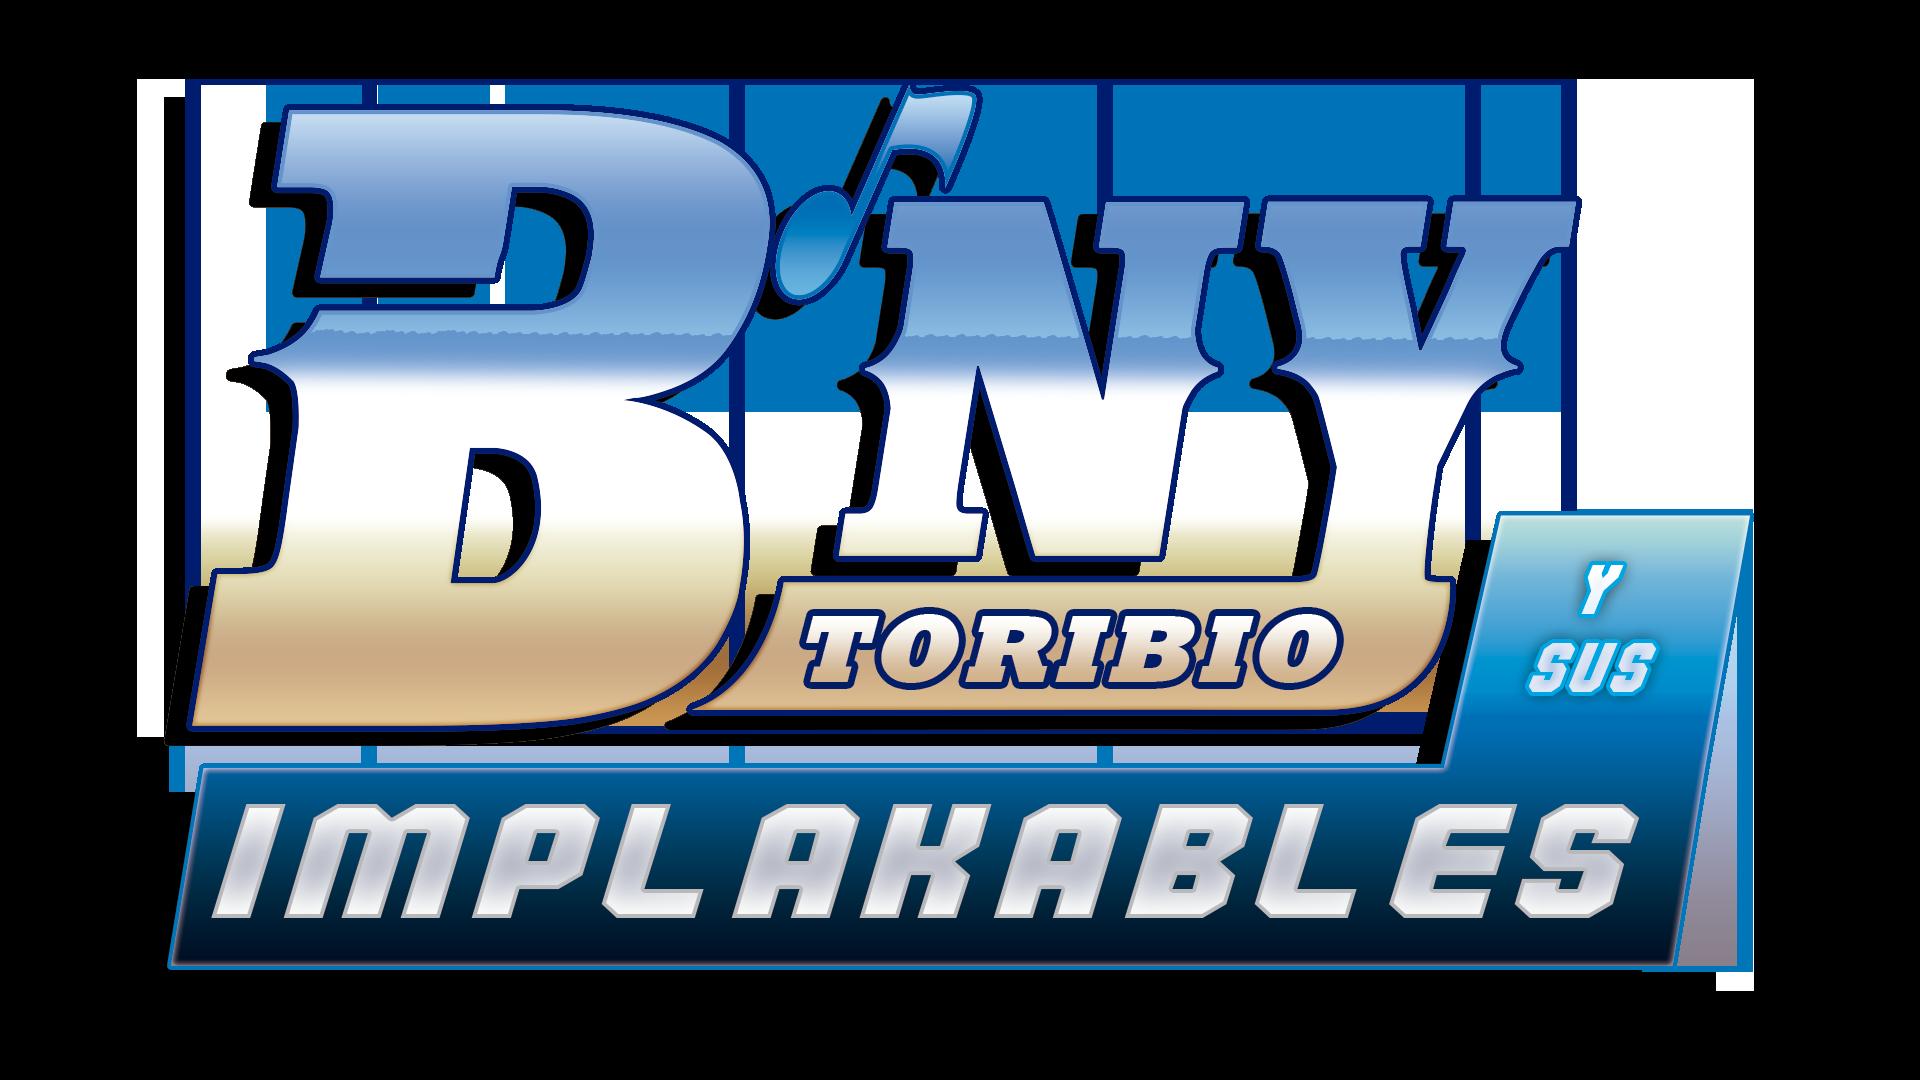 BENNY TORIBIO